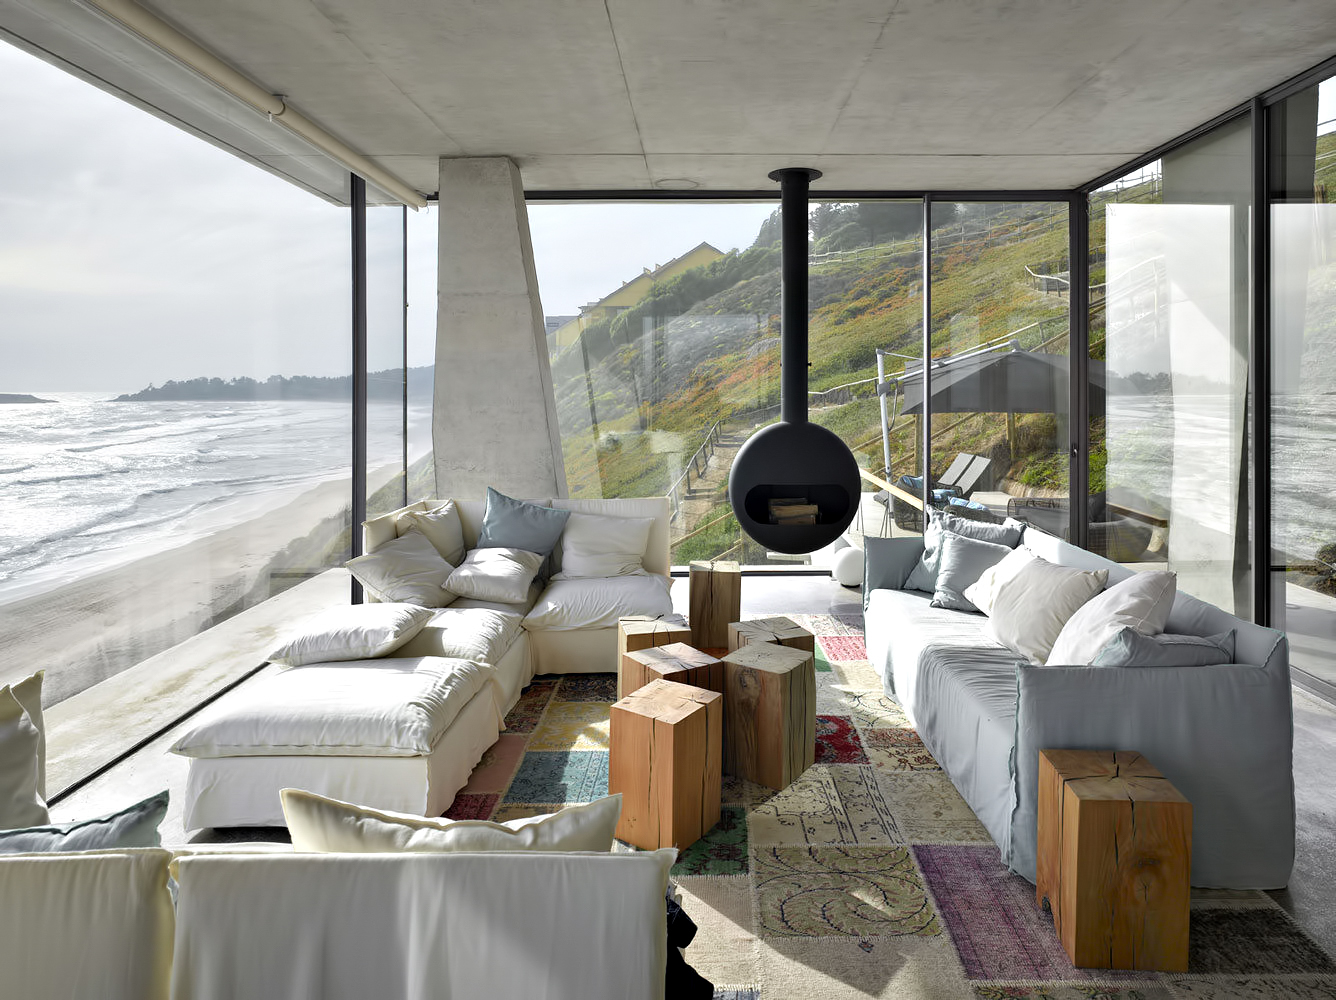 Ghat Luxury Beach House – Zapallar, Chile